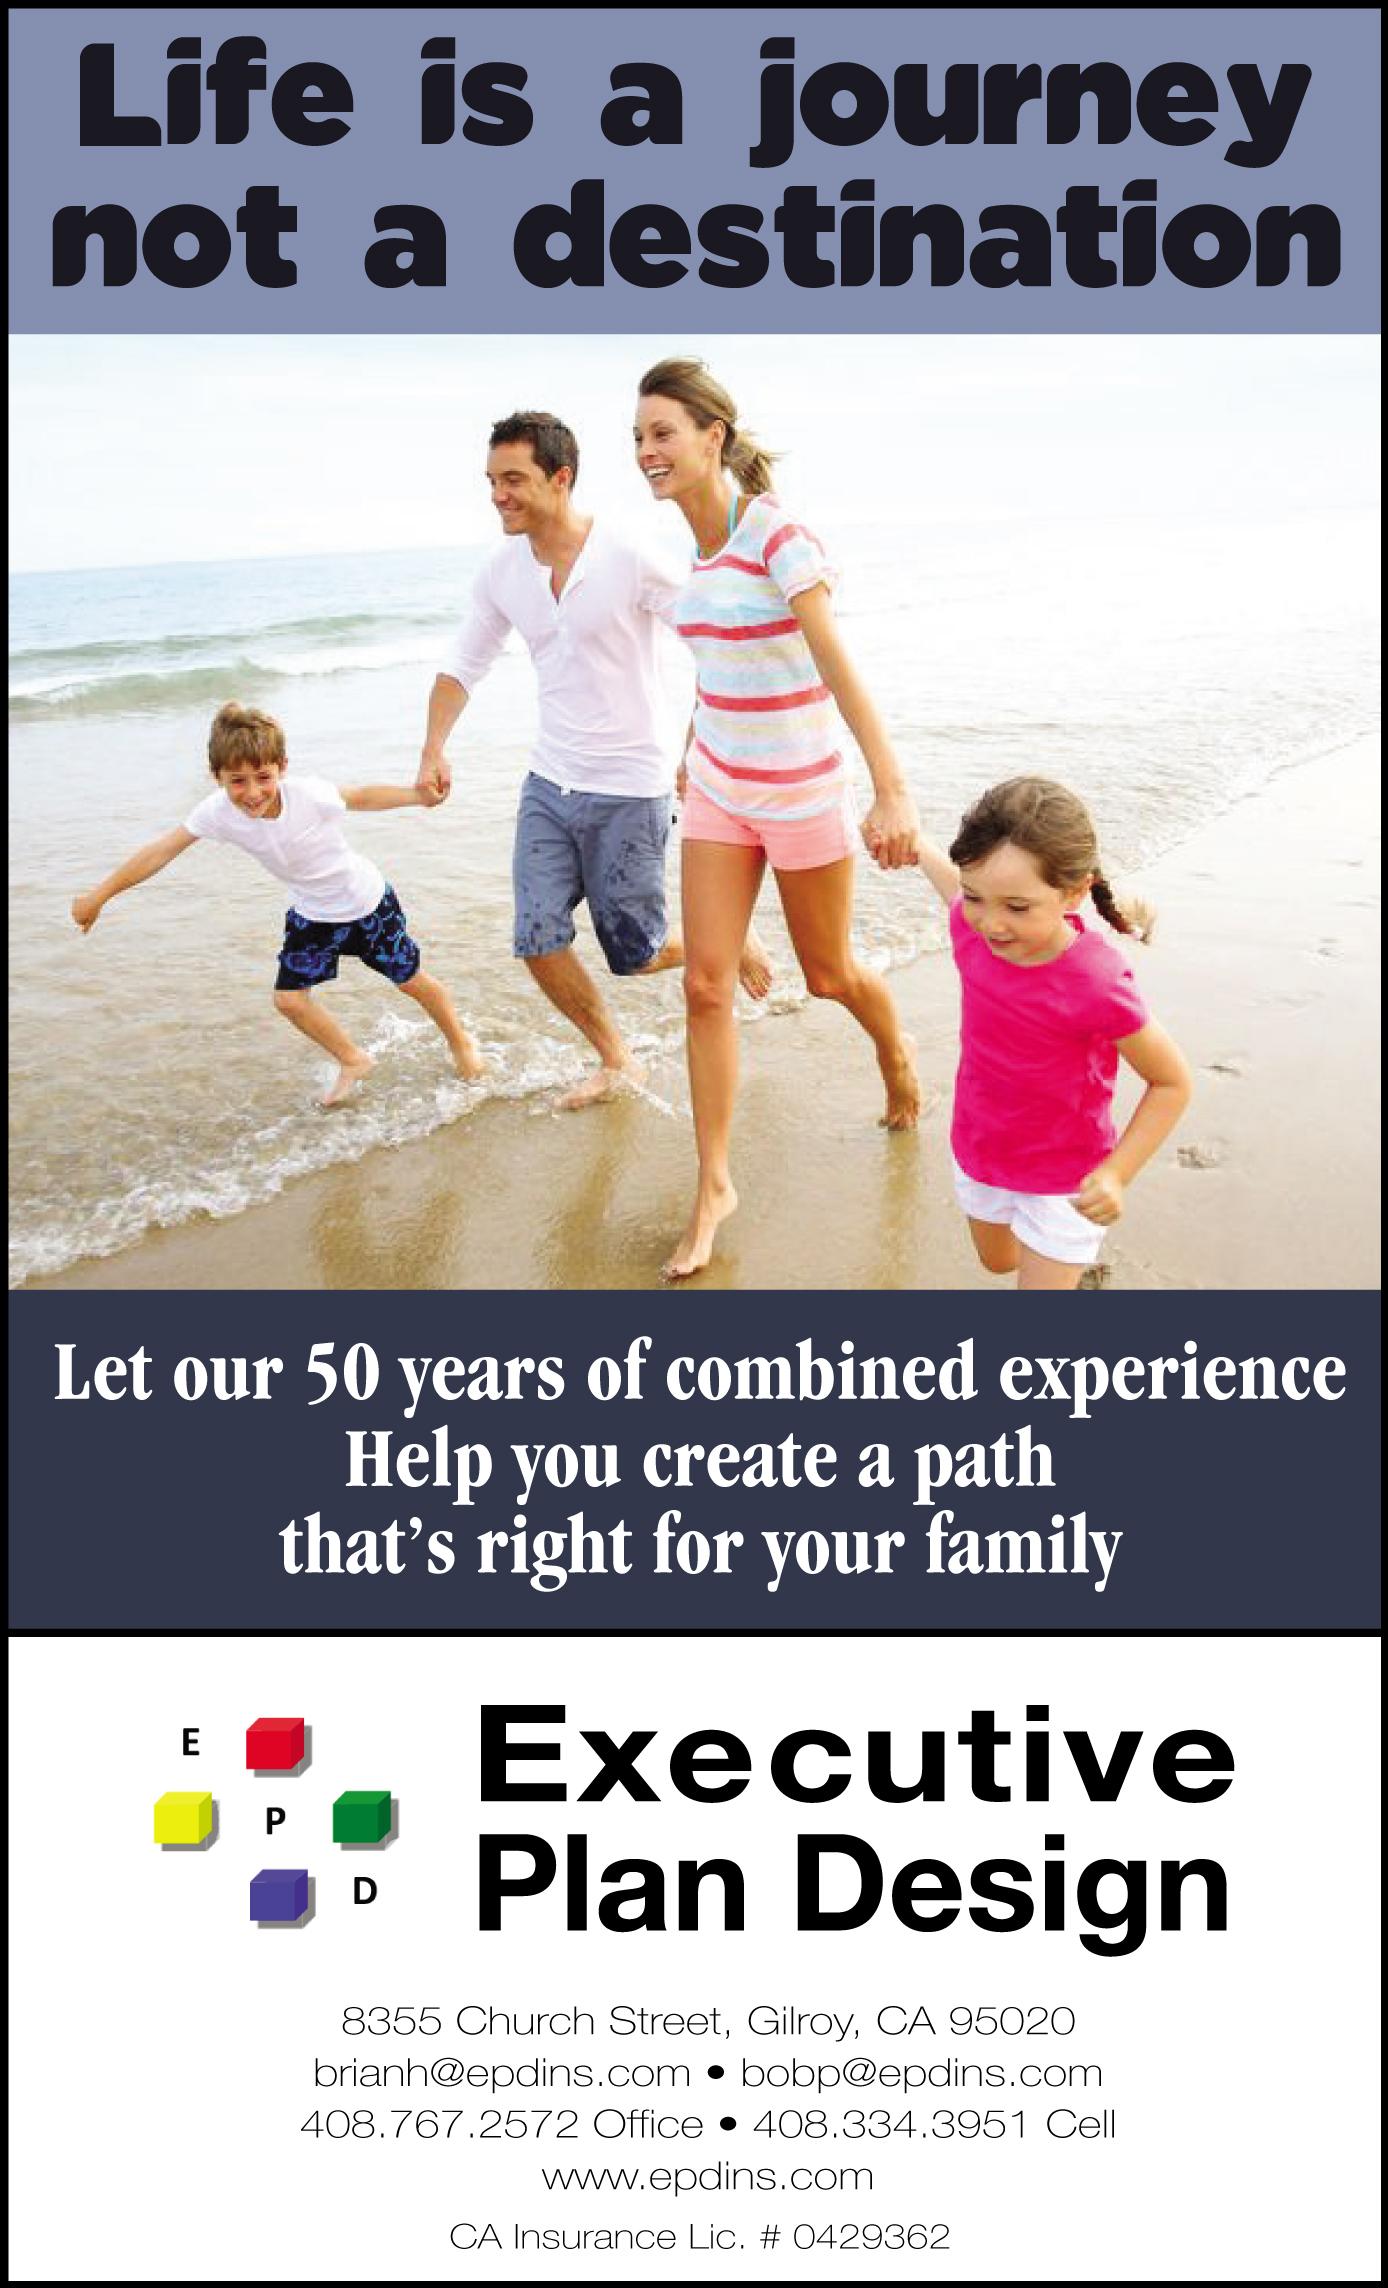 executive plan design gilroy life